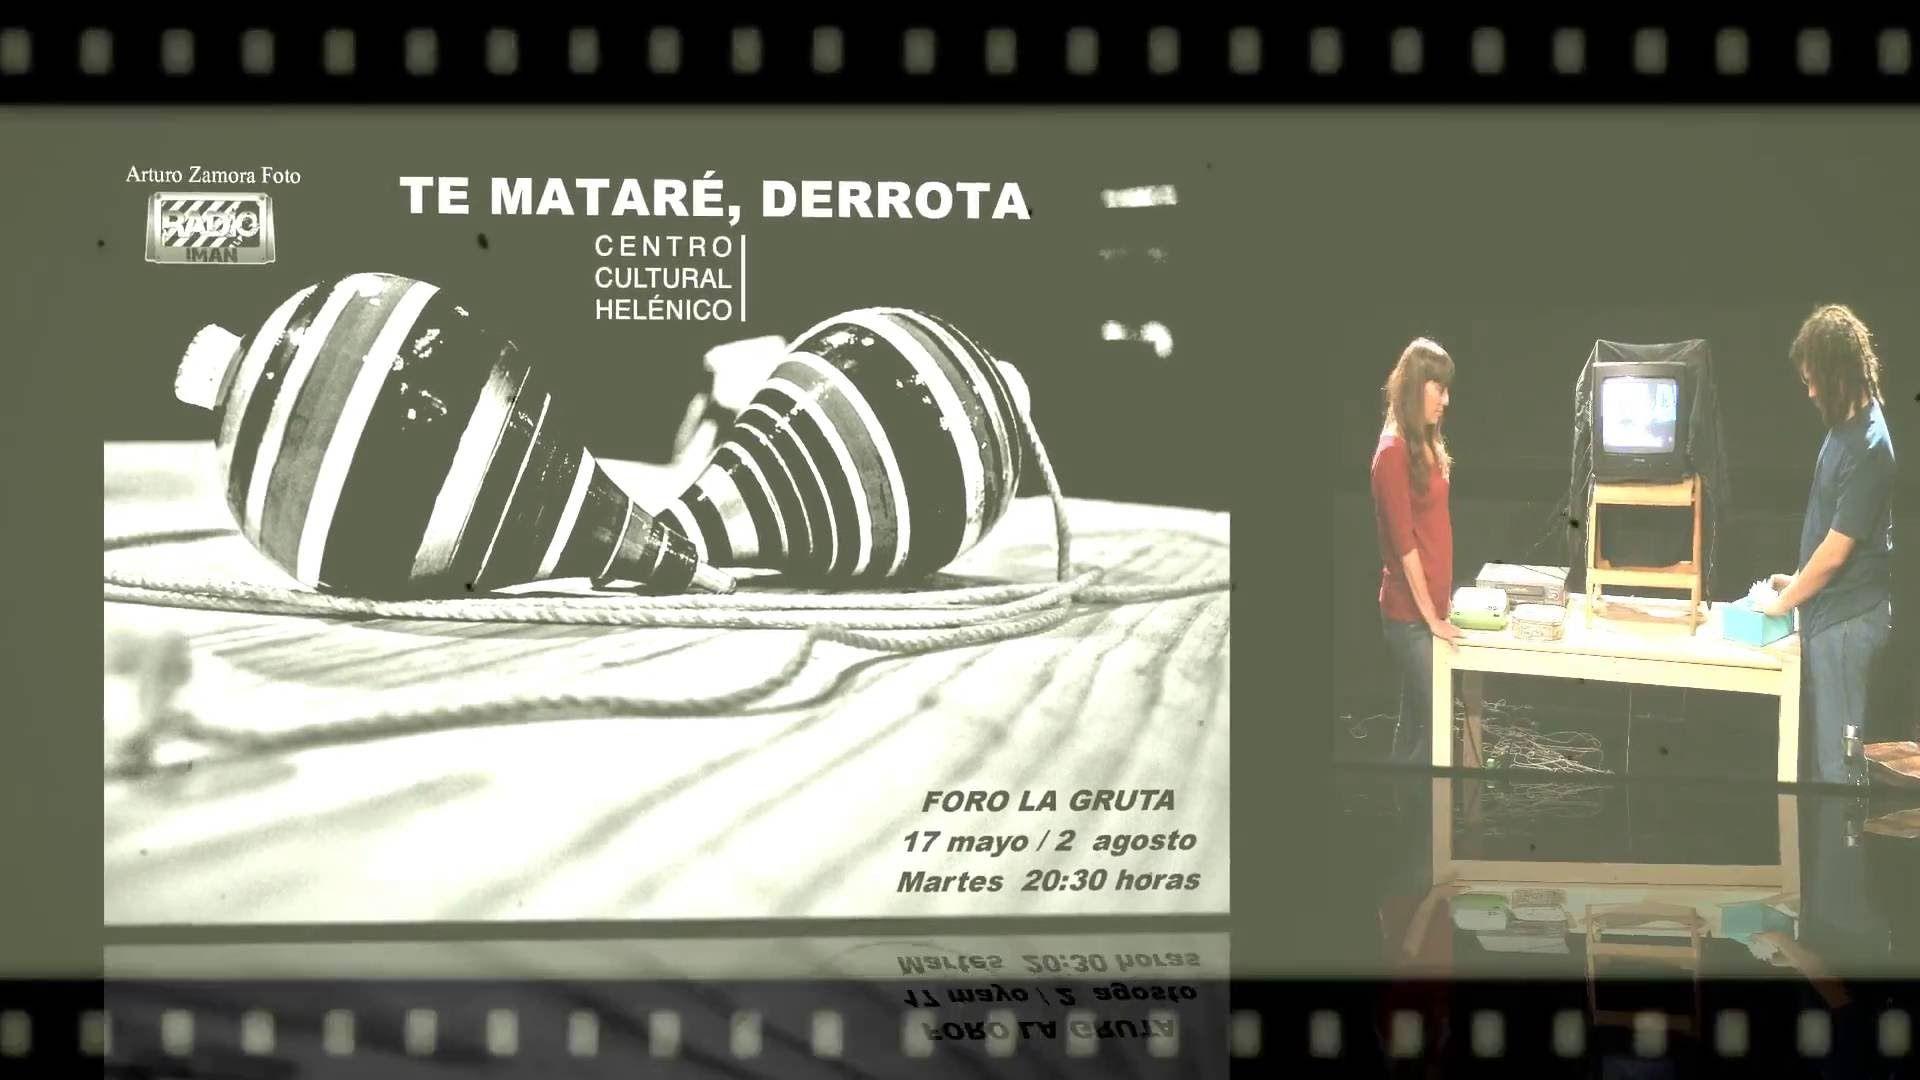 CC HELÉNICO, FORO LA GRUTA.  TE MATARÉ, DERROTA